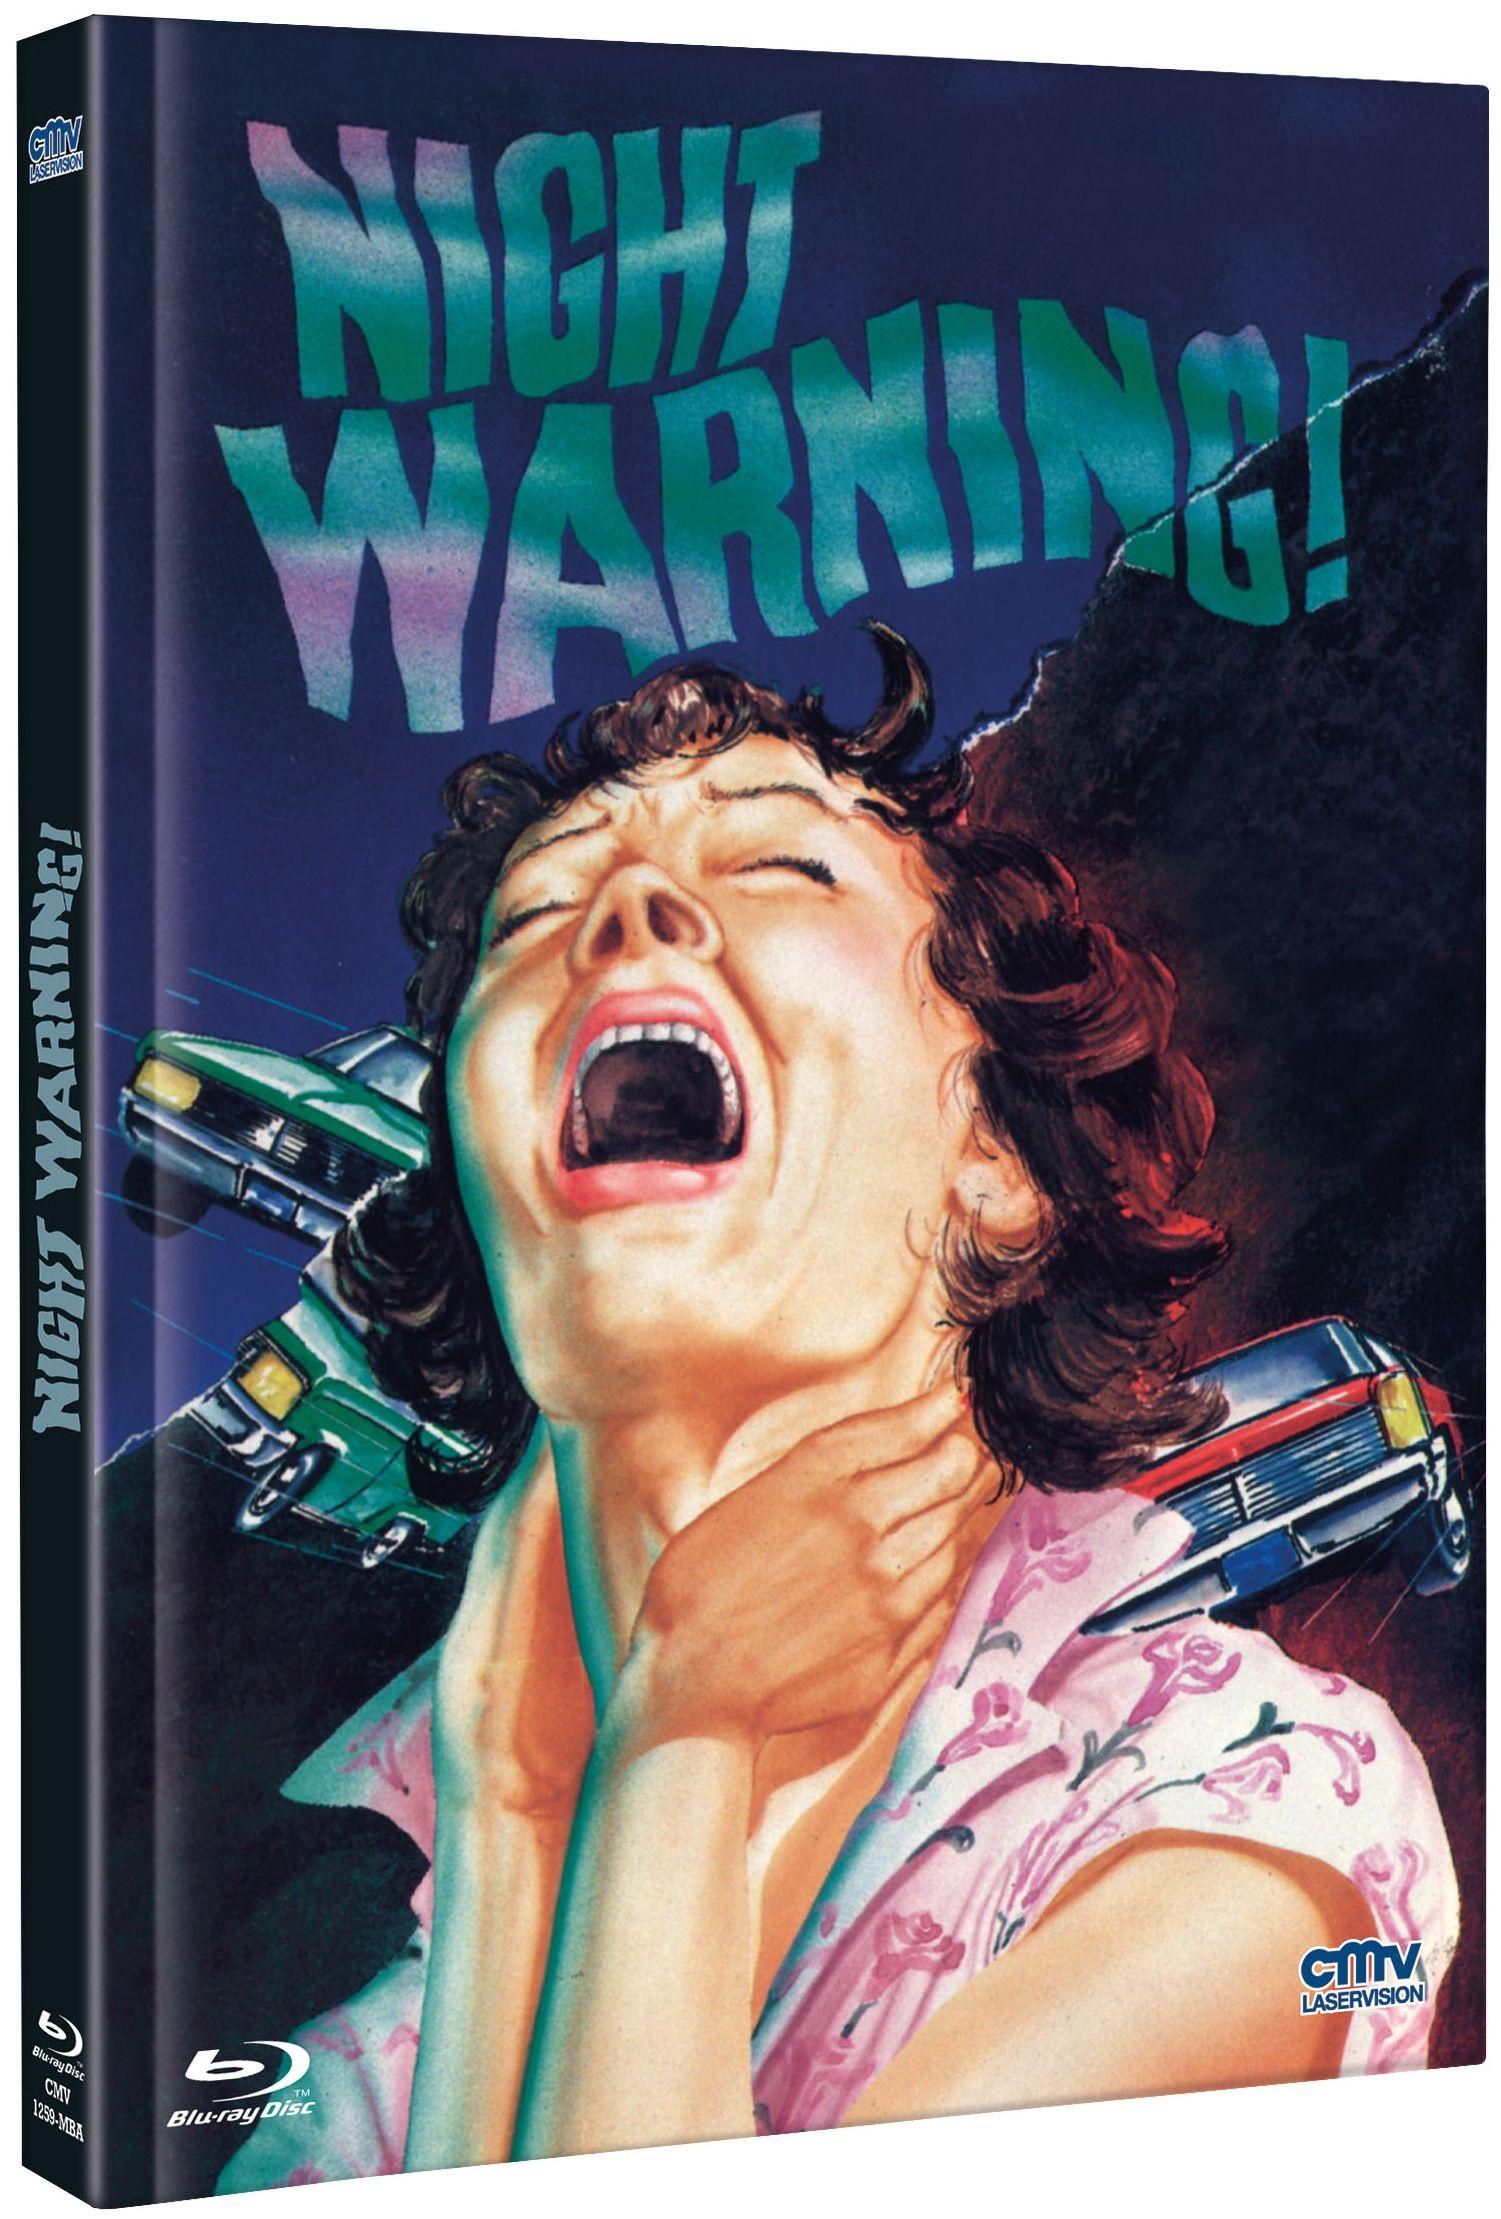 Night Warning (Lim. Uncut Mediabook - Cover A) (DVD + BLURAY)